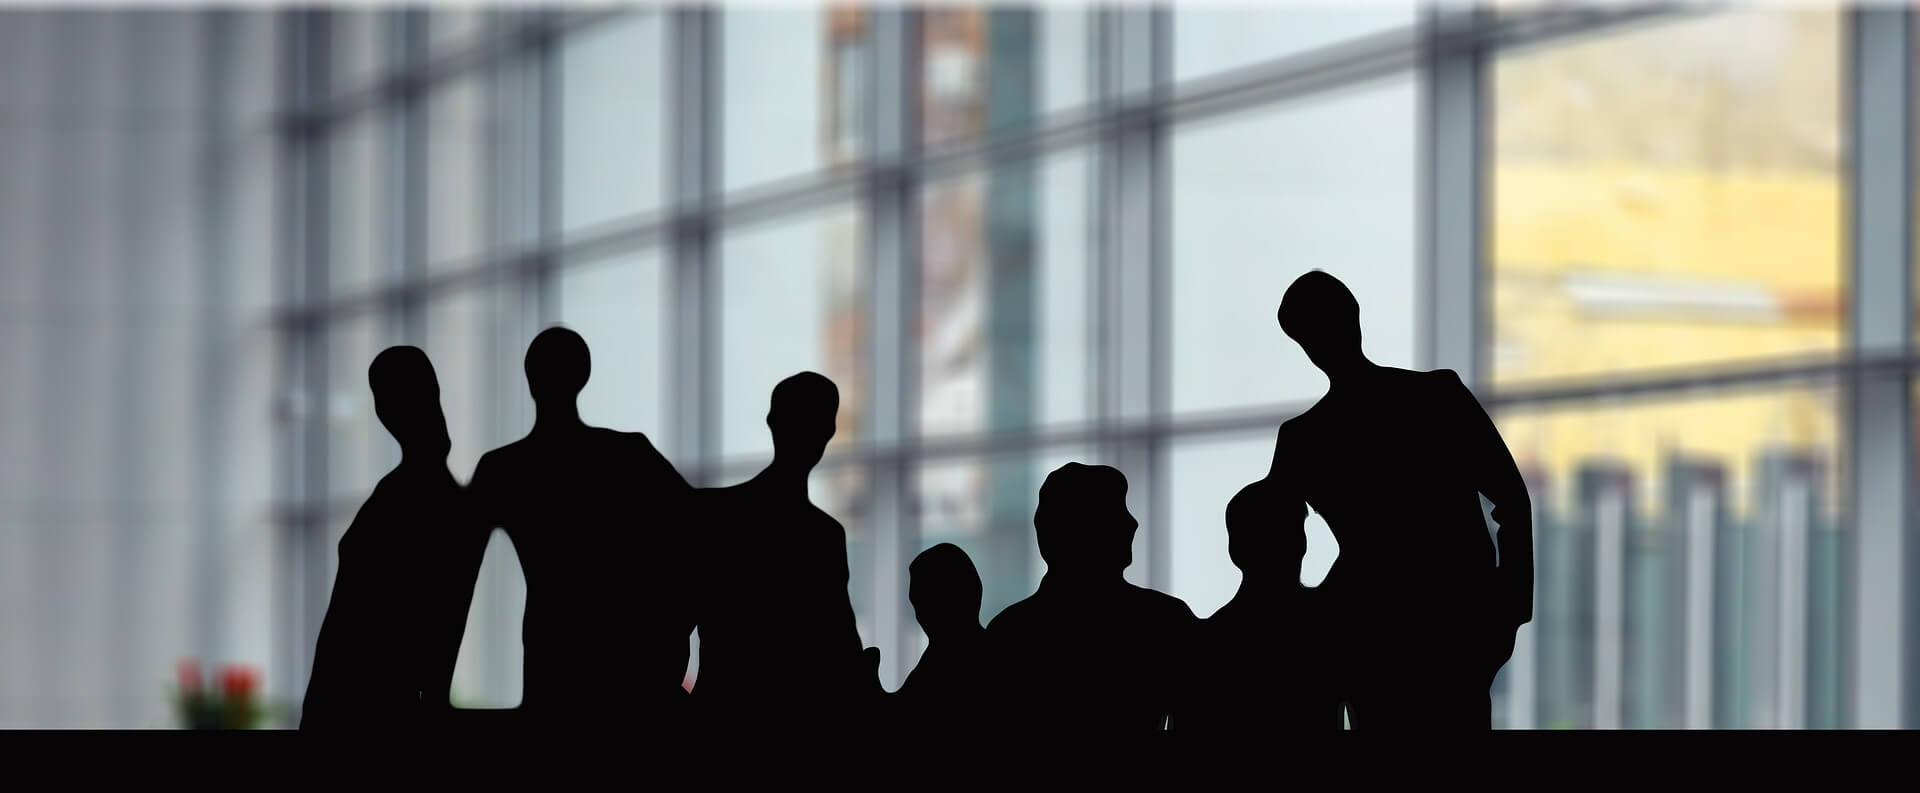 Is Belonging the Key to Employee Wellbeing?